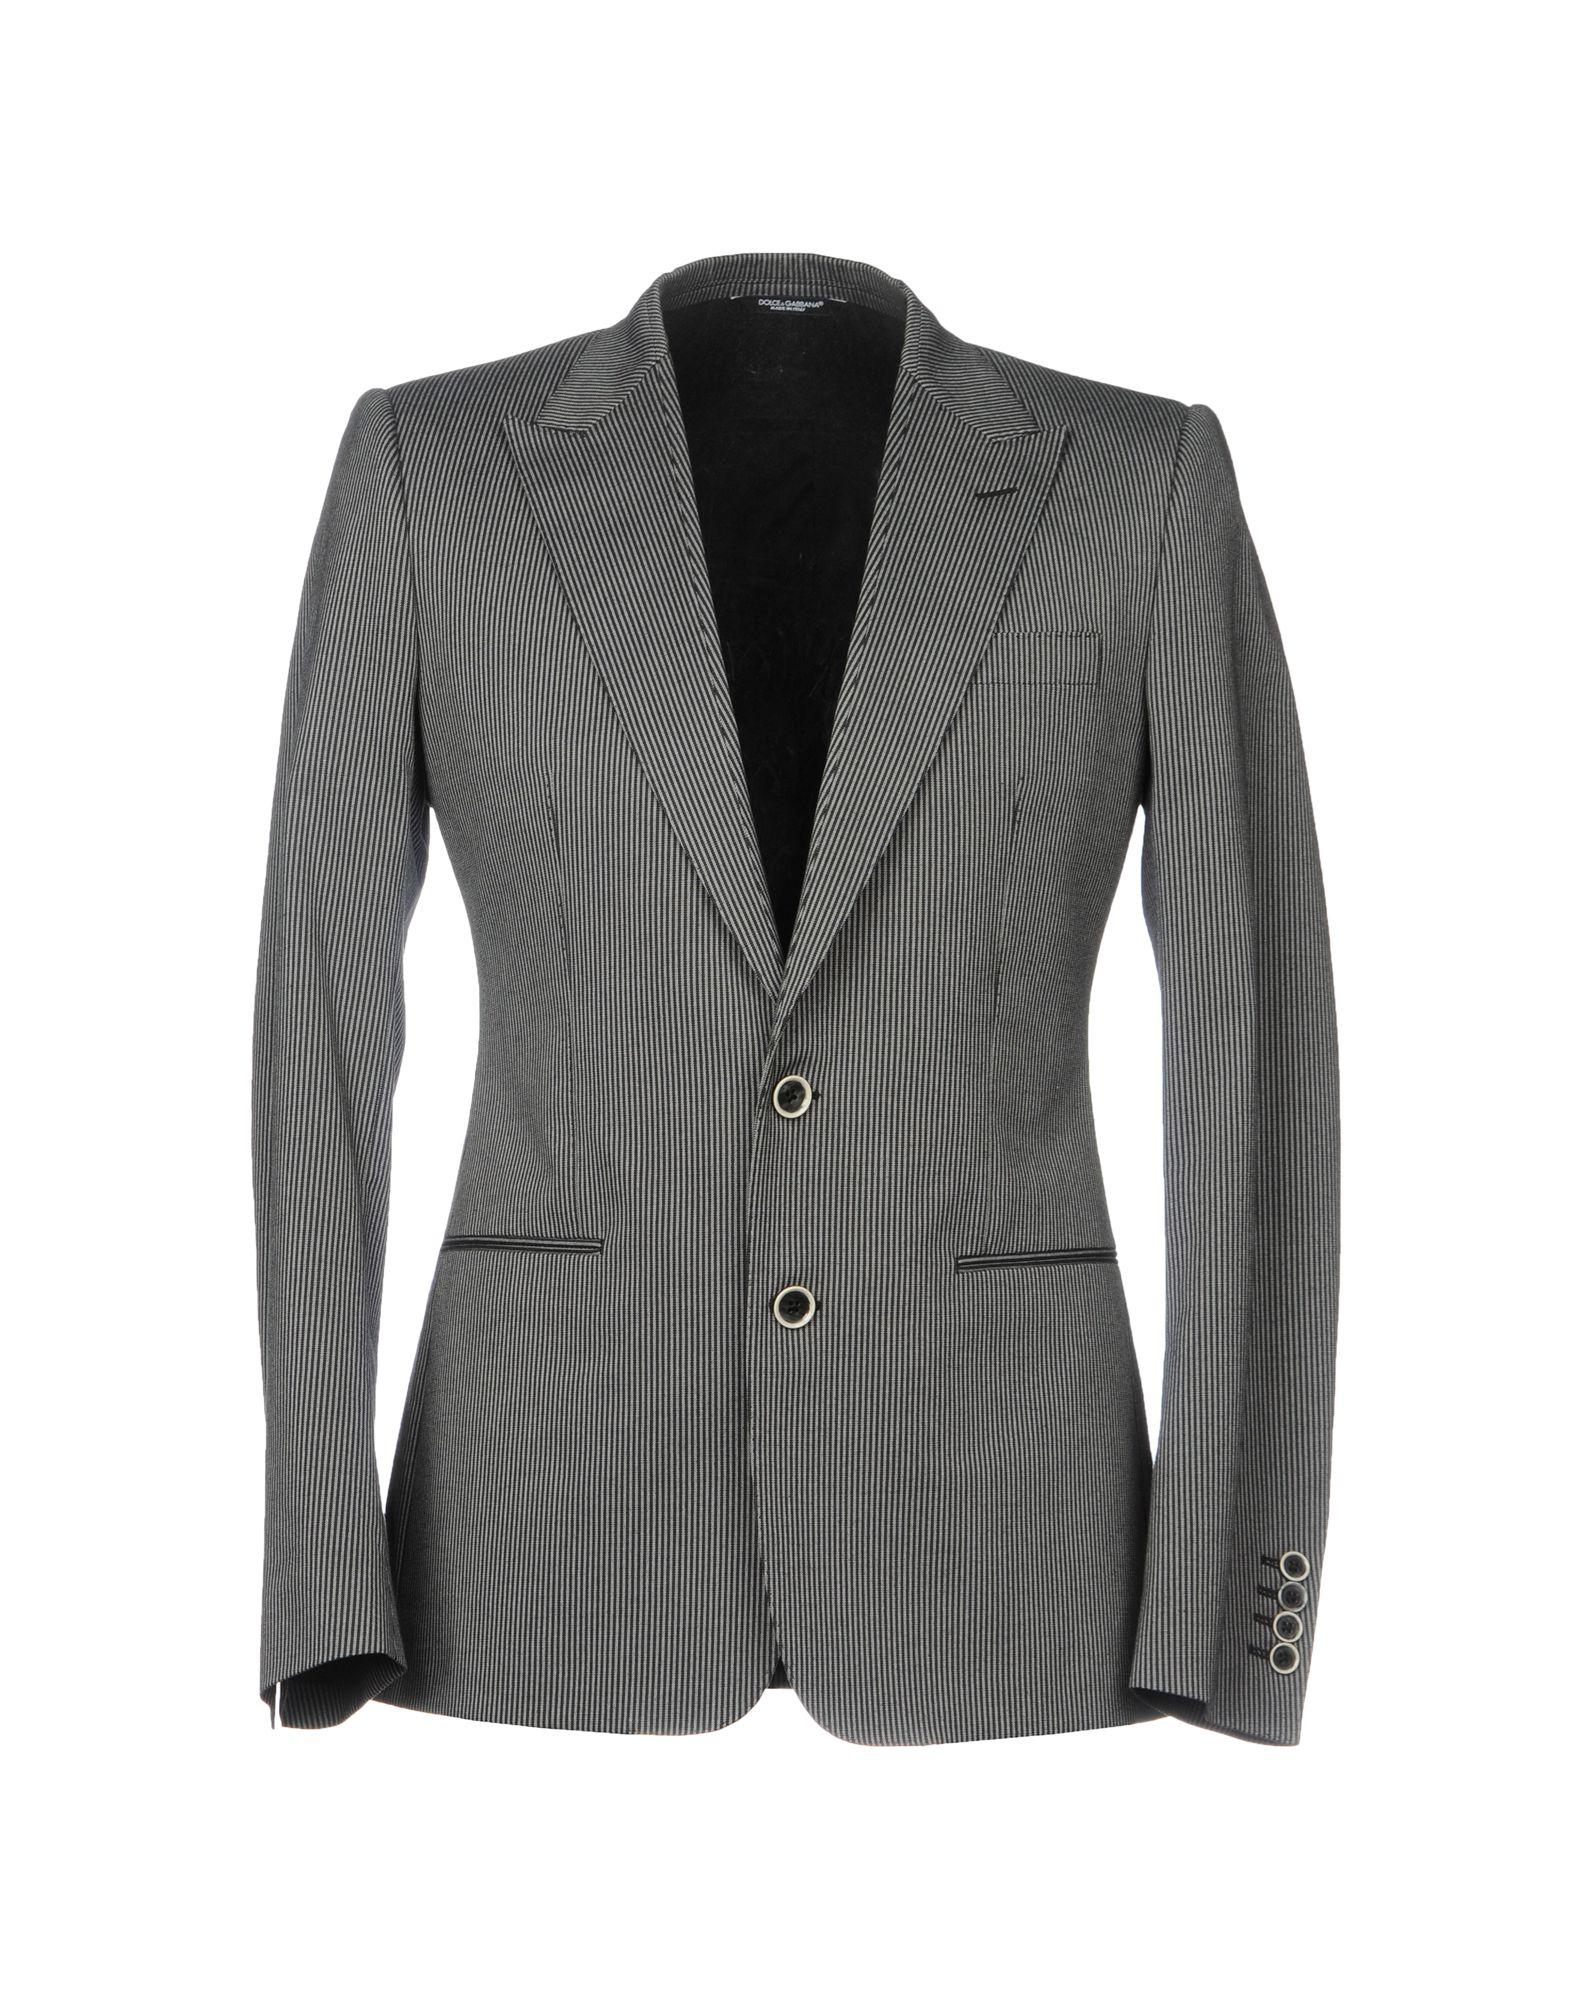 Giacca Dolce & Gabbana Uomo - Acquista online su